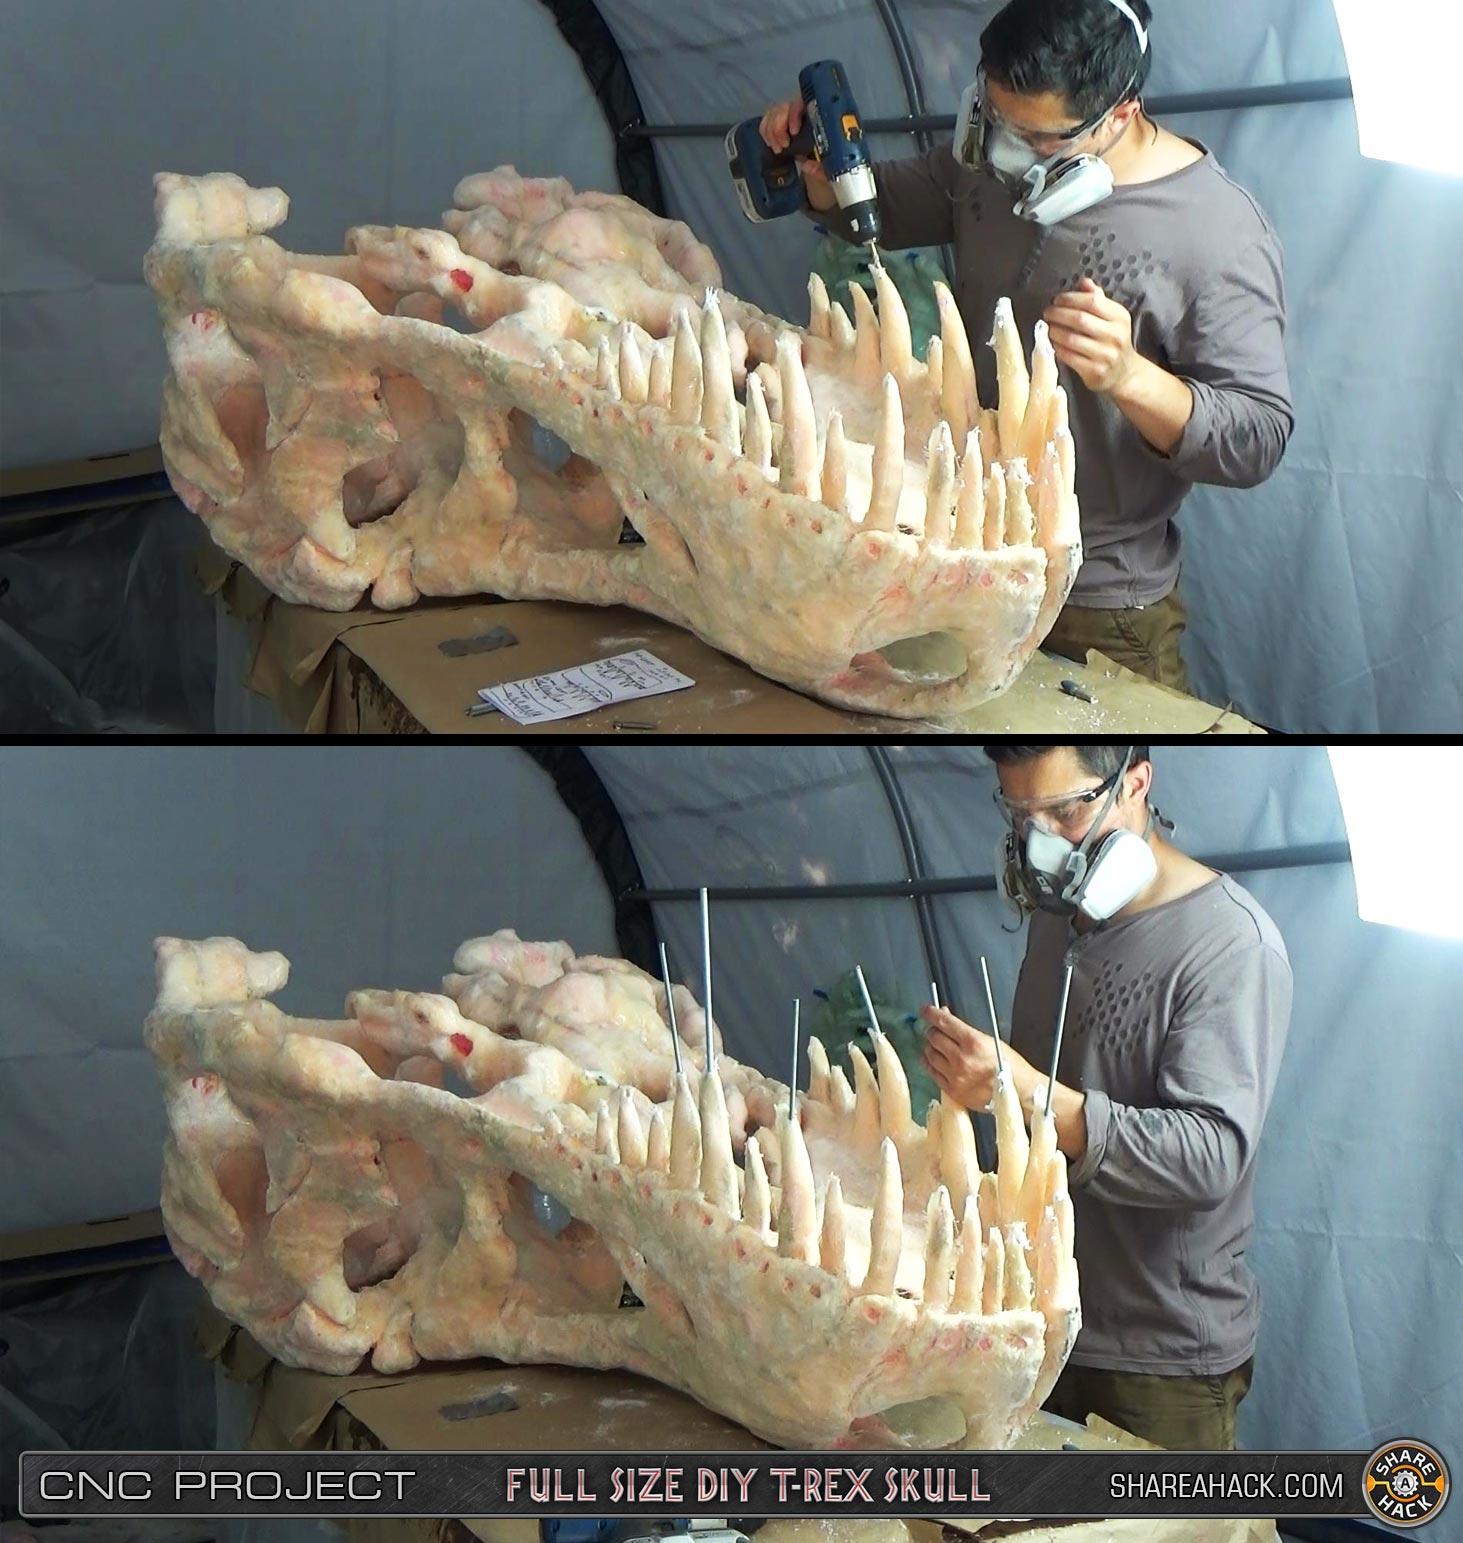 shareahack_diy-trex-skull-cnc-foam_3dmodel_37-teeth-reinforcement.jpg